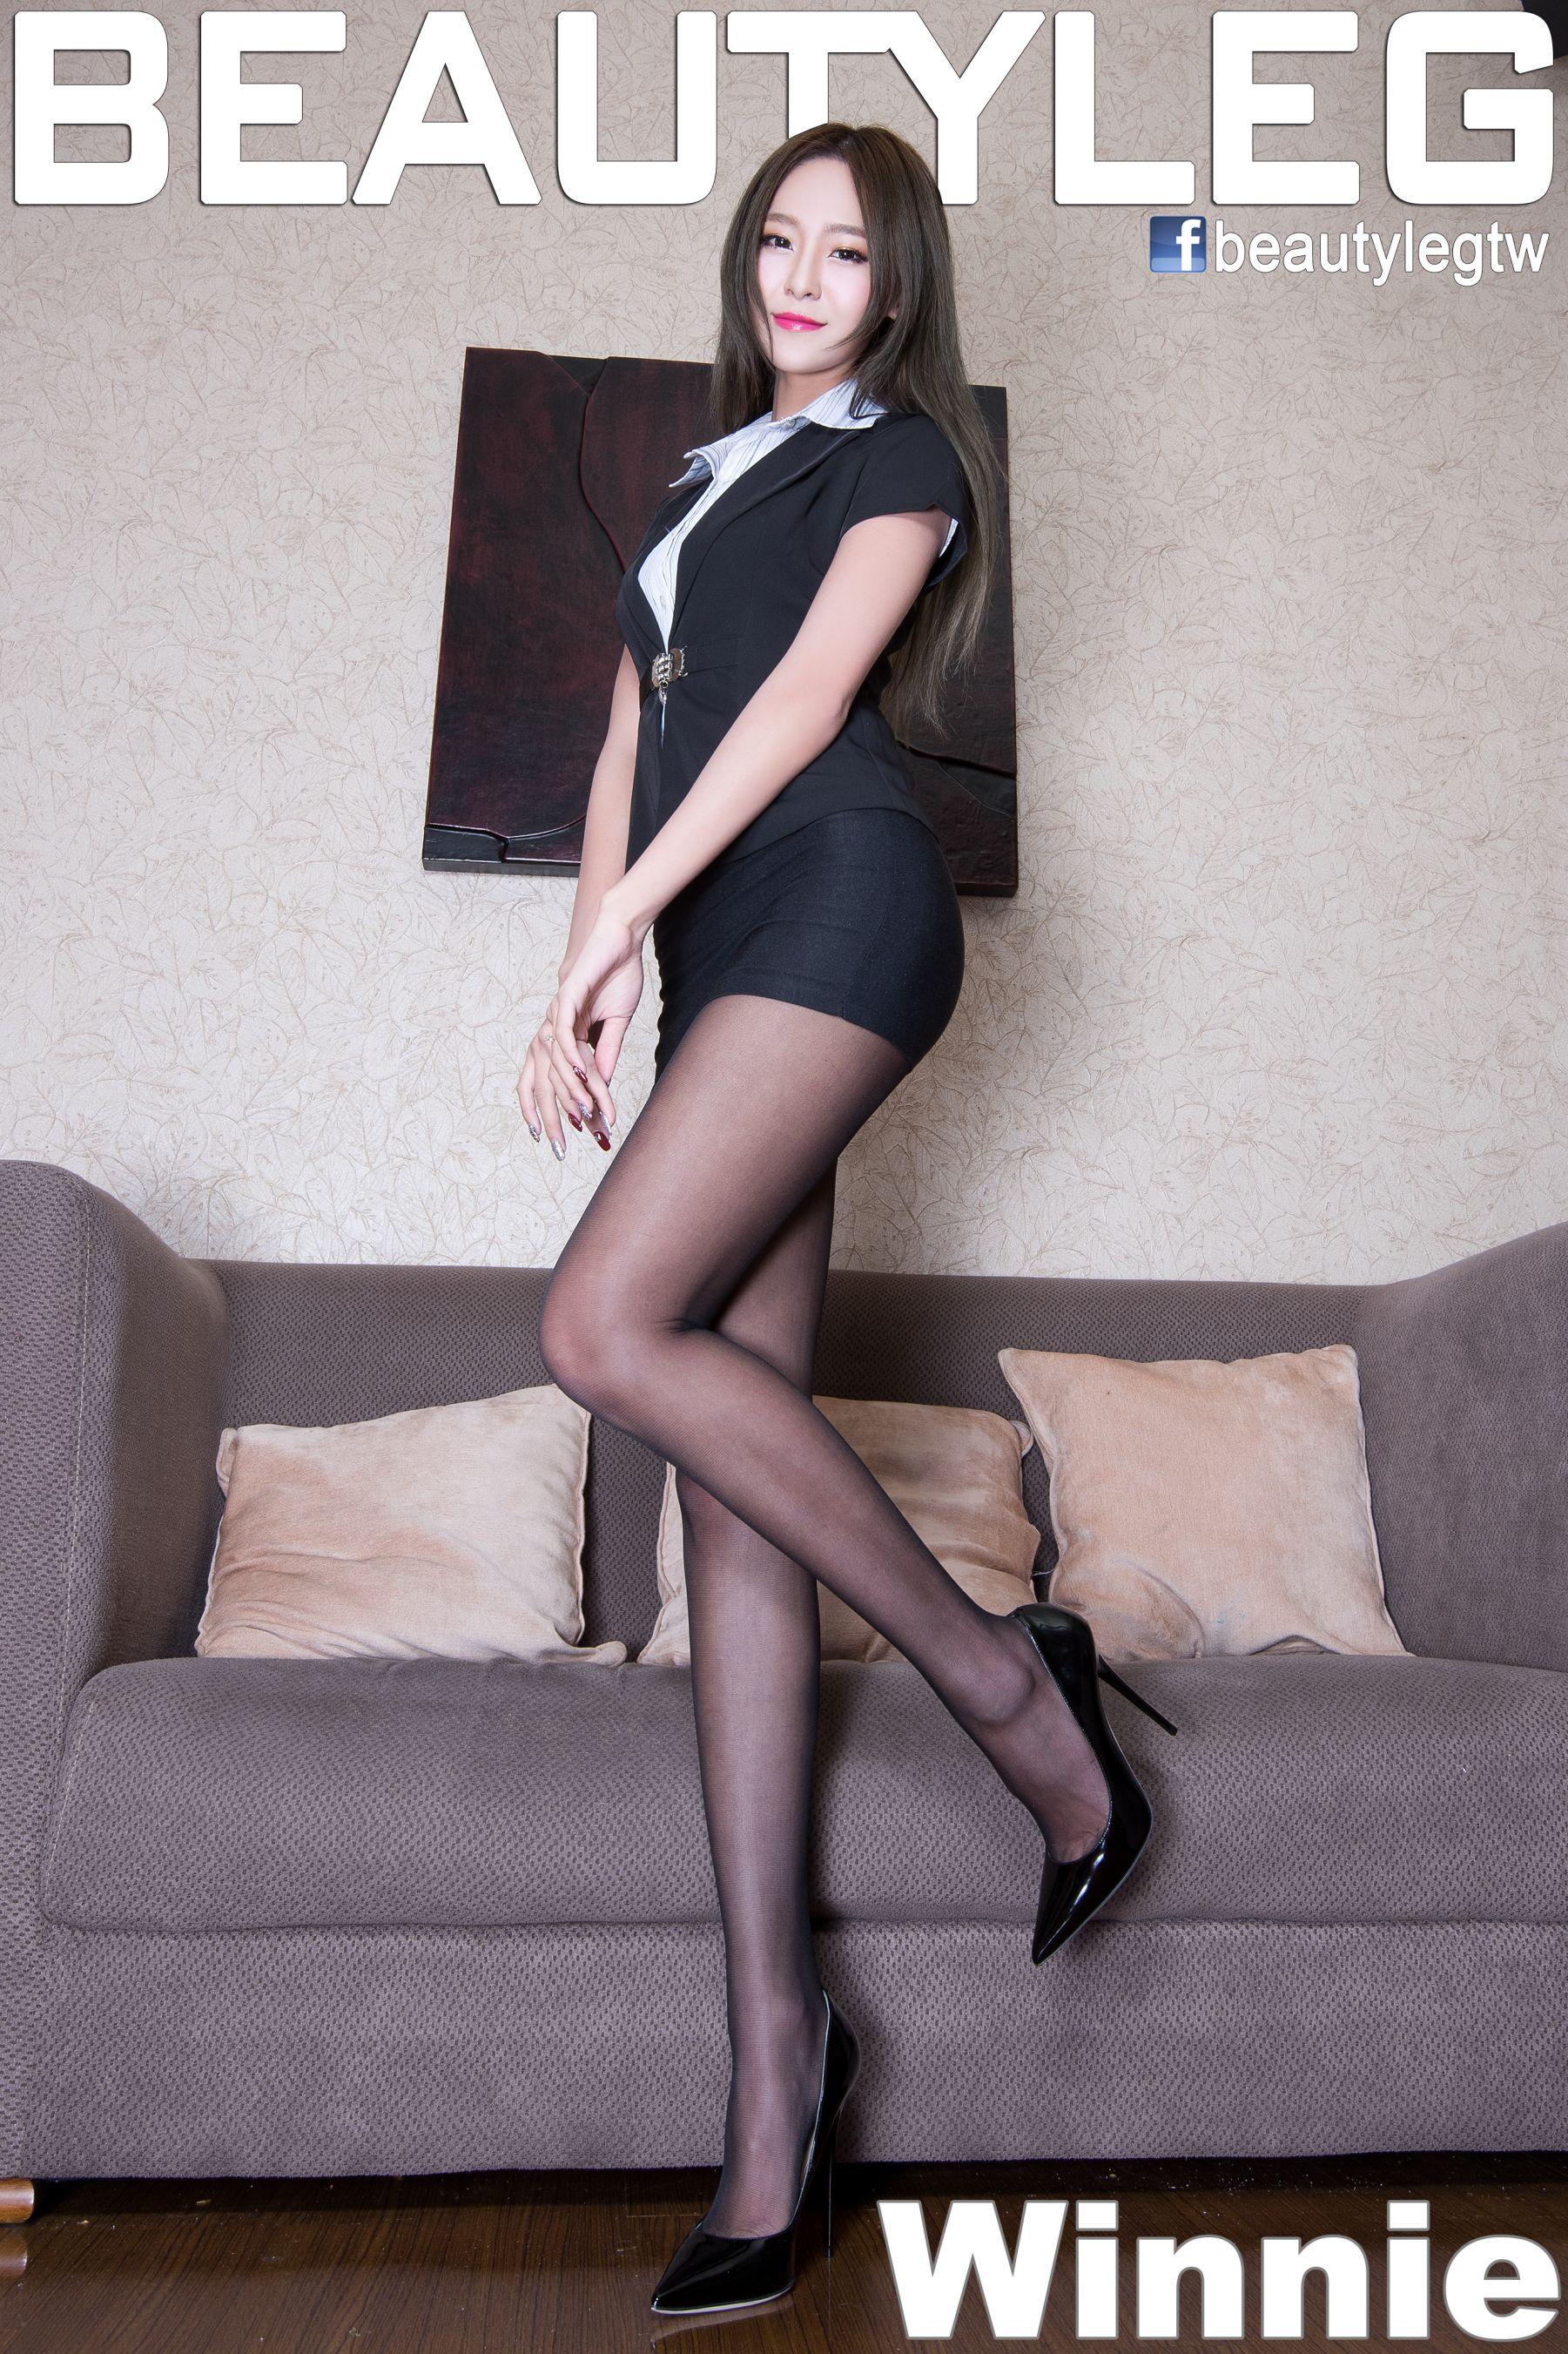 VOL.1578 [Beautyleg]高跟美腿:Winnie小雪(庄咏惠,庄温妮,腿模Winnie)高品质写真套图(53P)